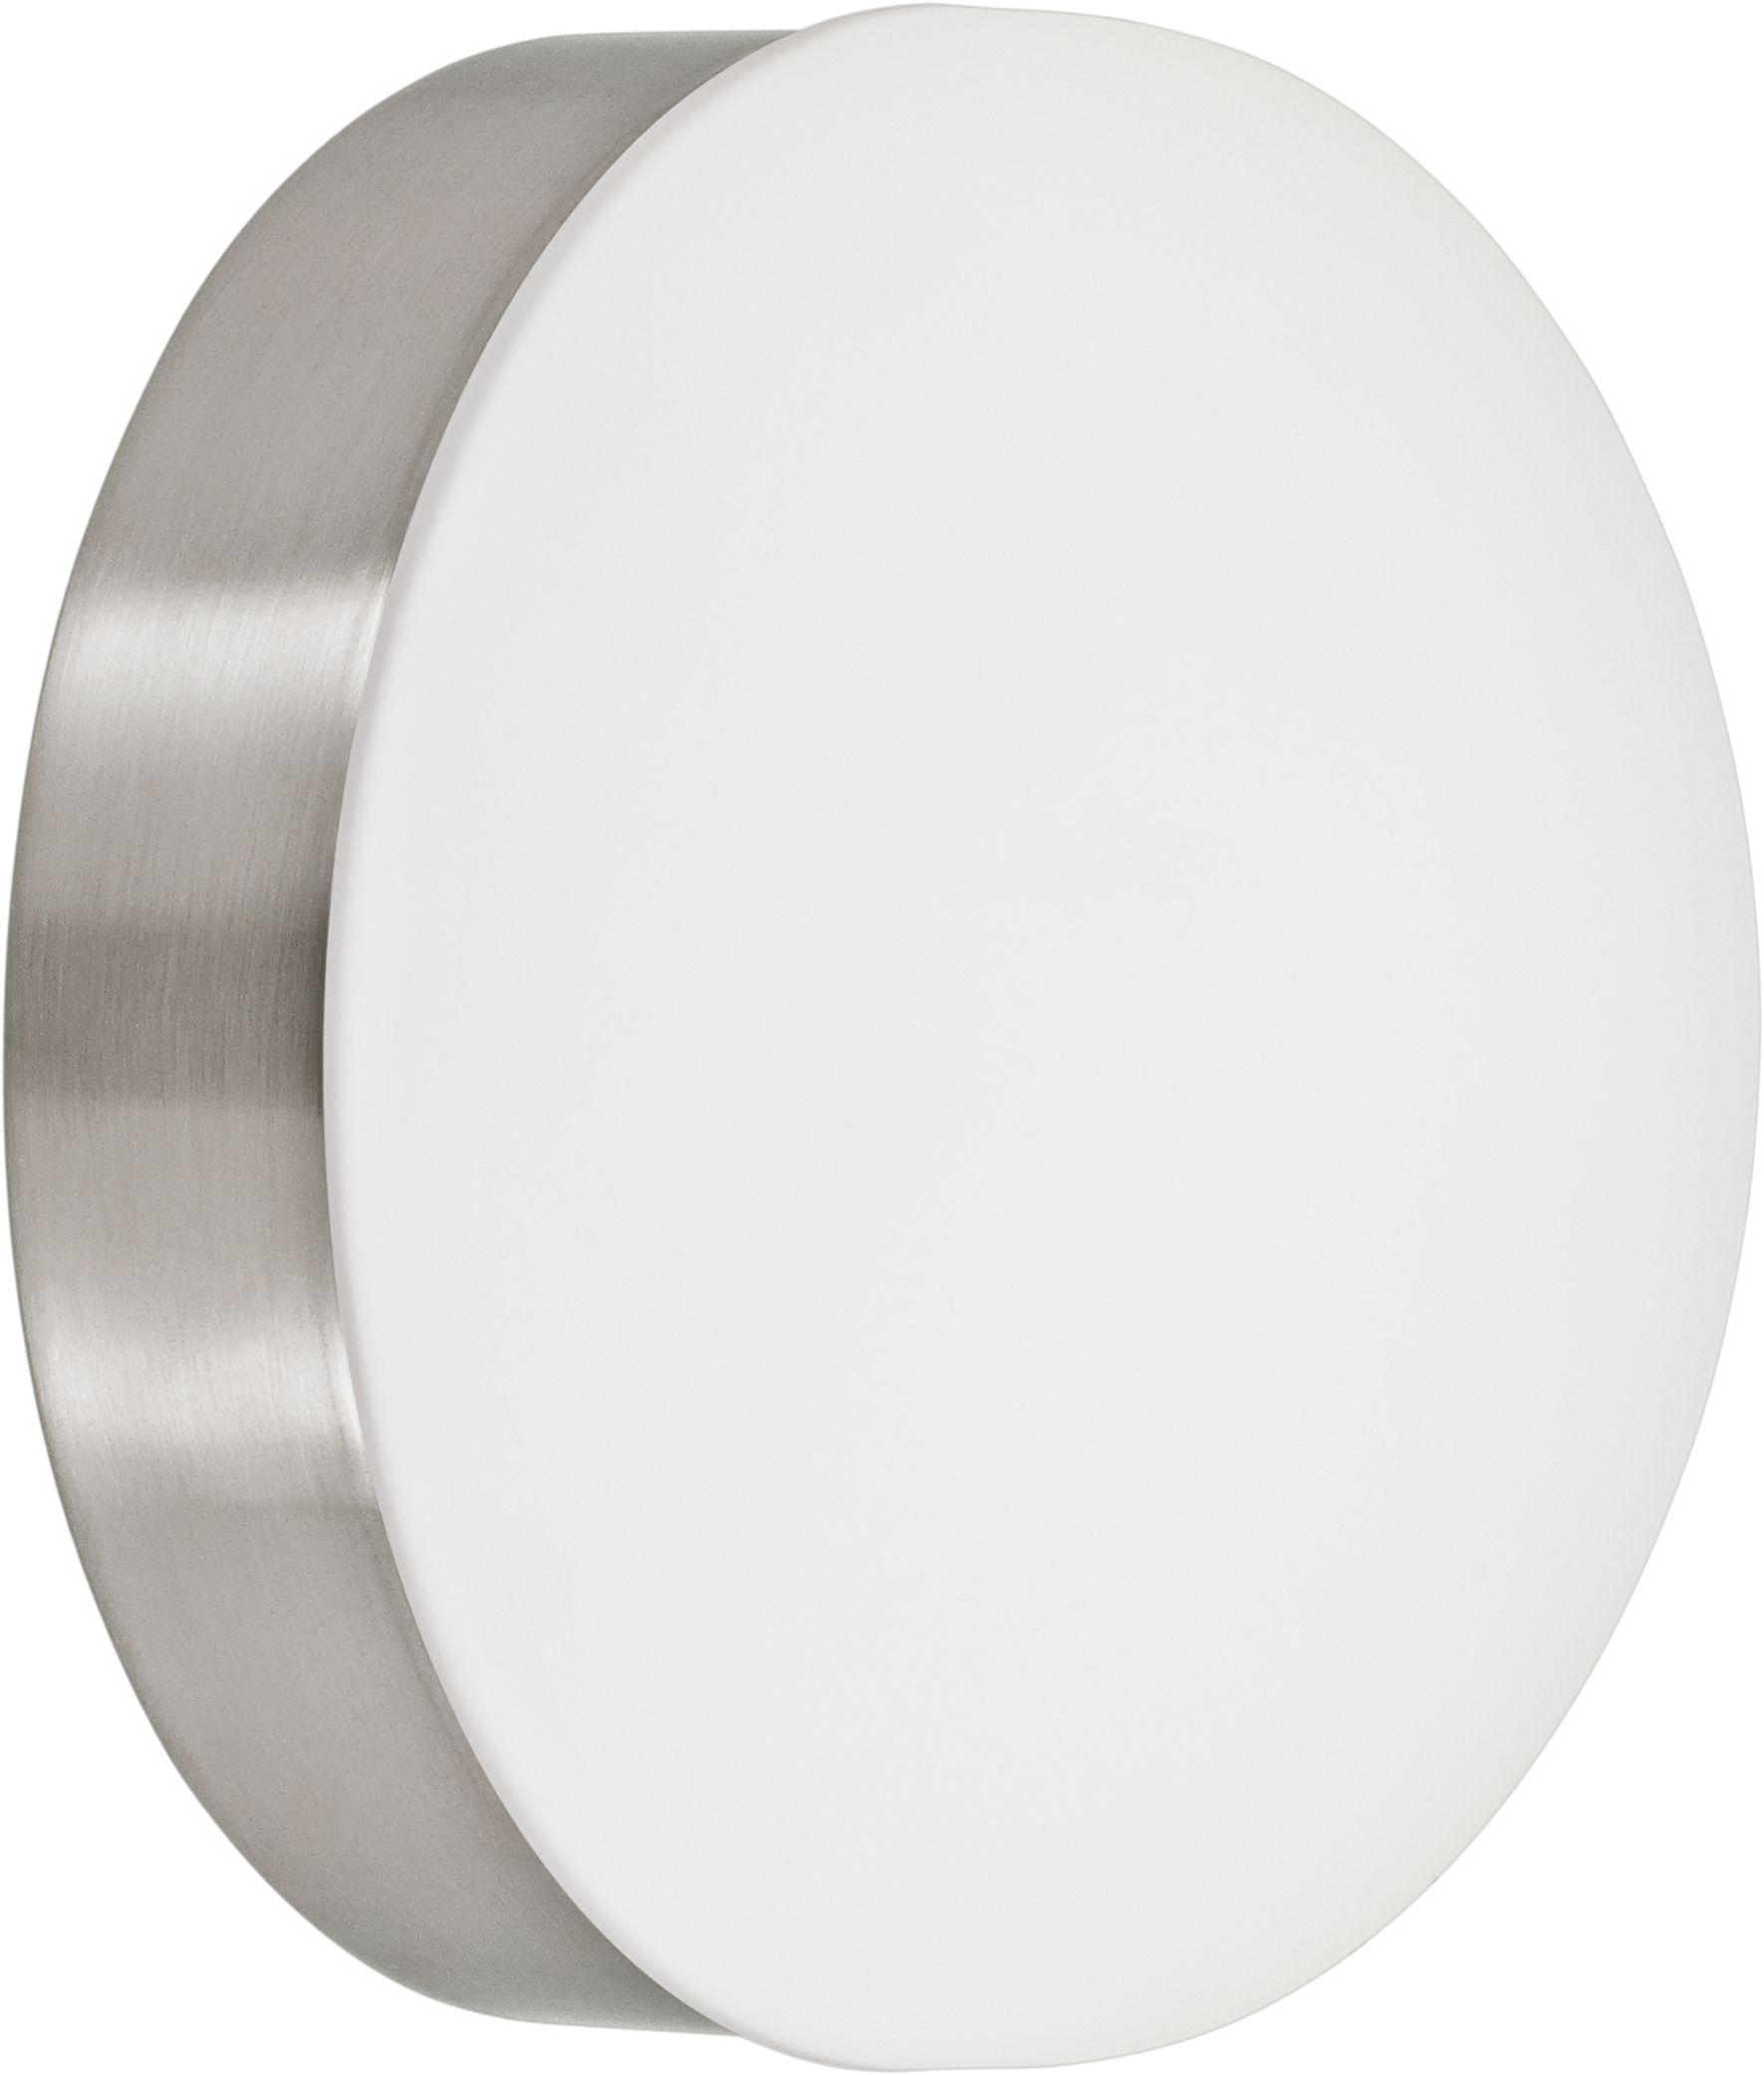 Eglo kinkiet LED Cupella 96002 - SUPER OFERTA - RABAT w koszyku